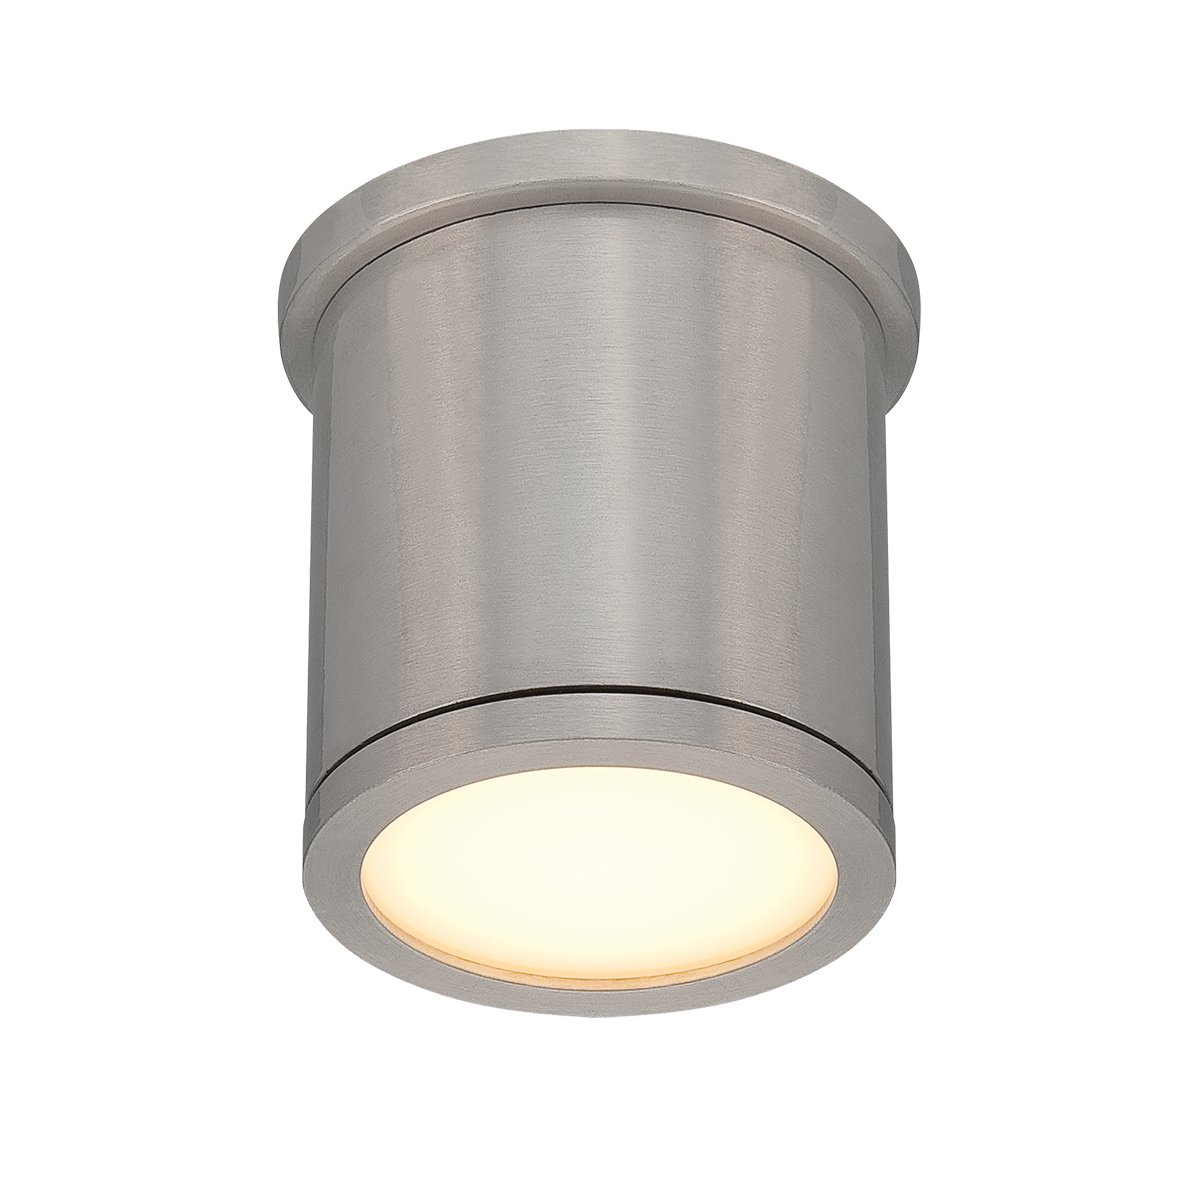 WAC Lighting FM-W2605-AL Tube 5'' Outdoor LED Flush Mount, Small, White/Brushed Aluminum